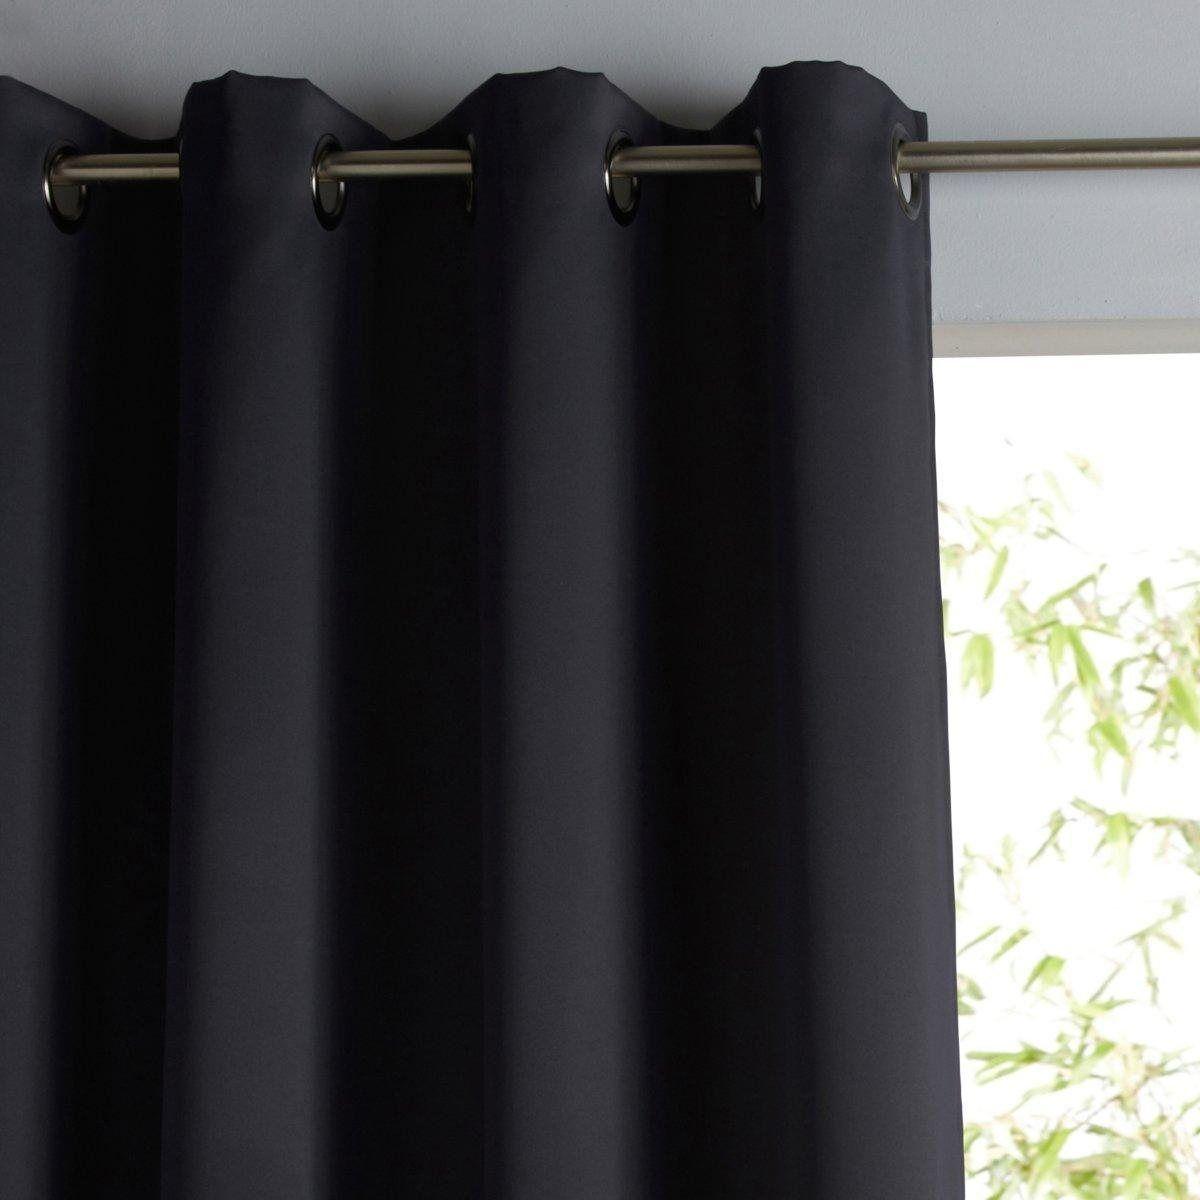 vente rideau tritoo maison et jardin. Black Bedroom Furniture Sets. Home Design Ideas